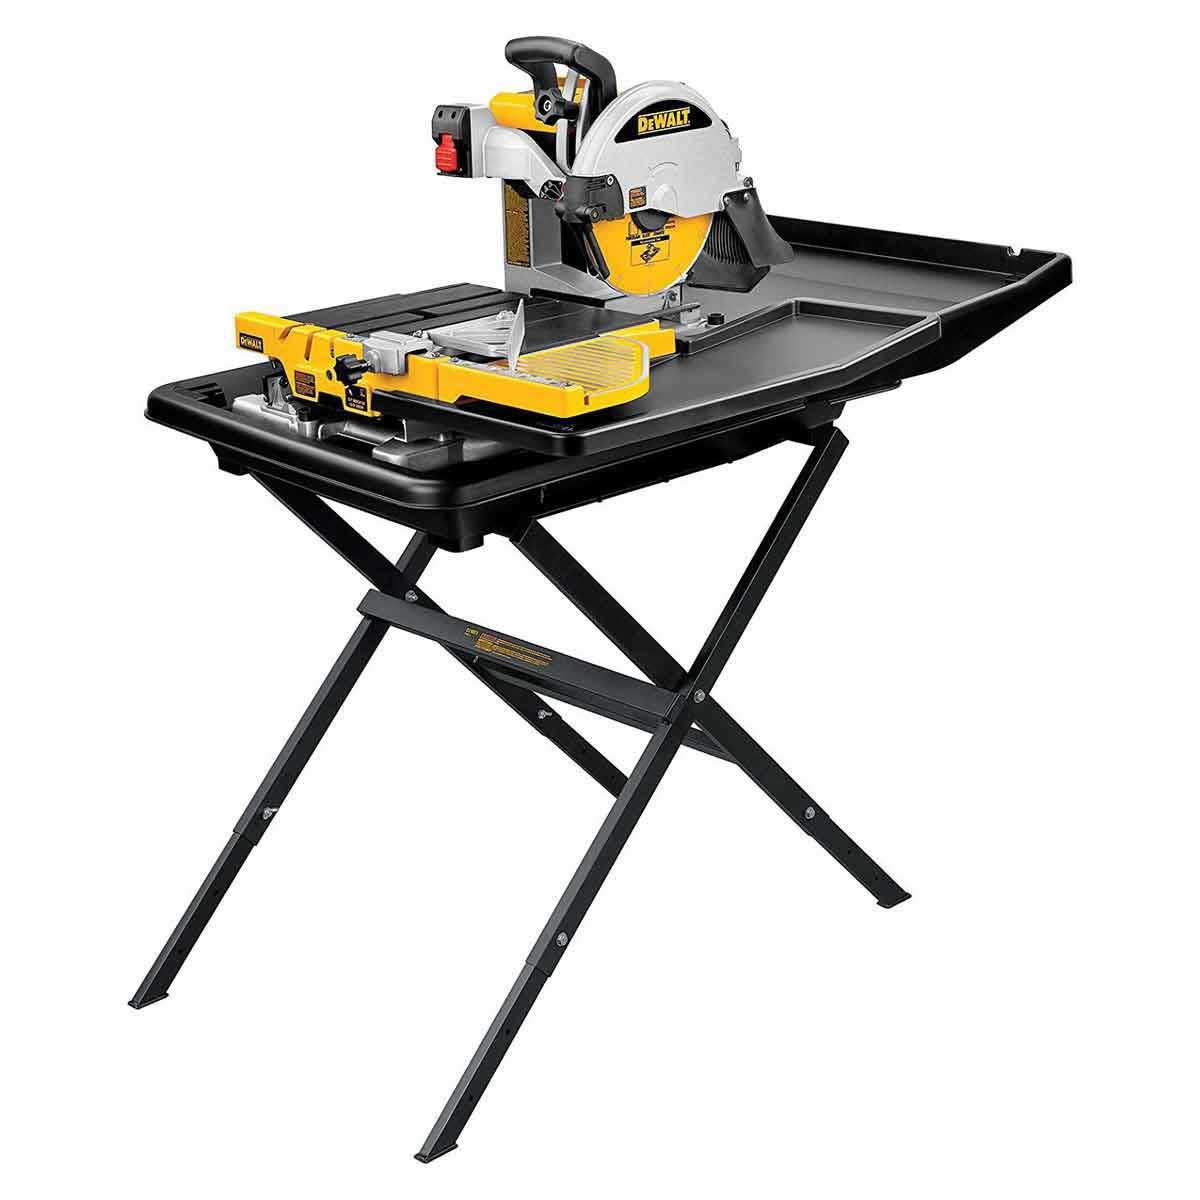 Dewalt D24000 wet tile saw and stand